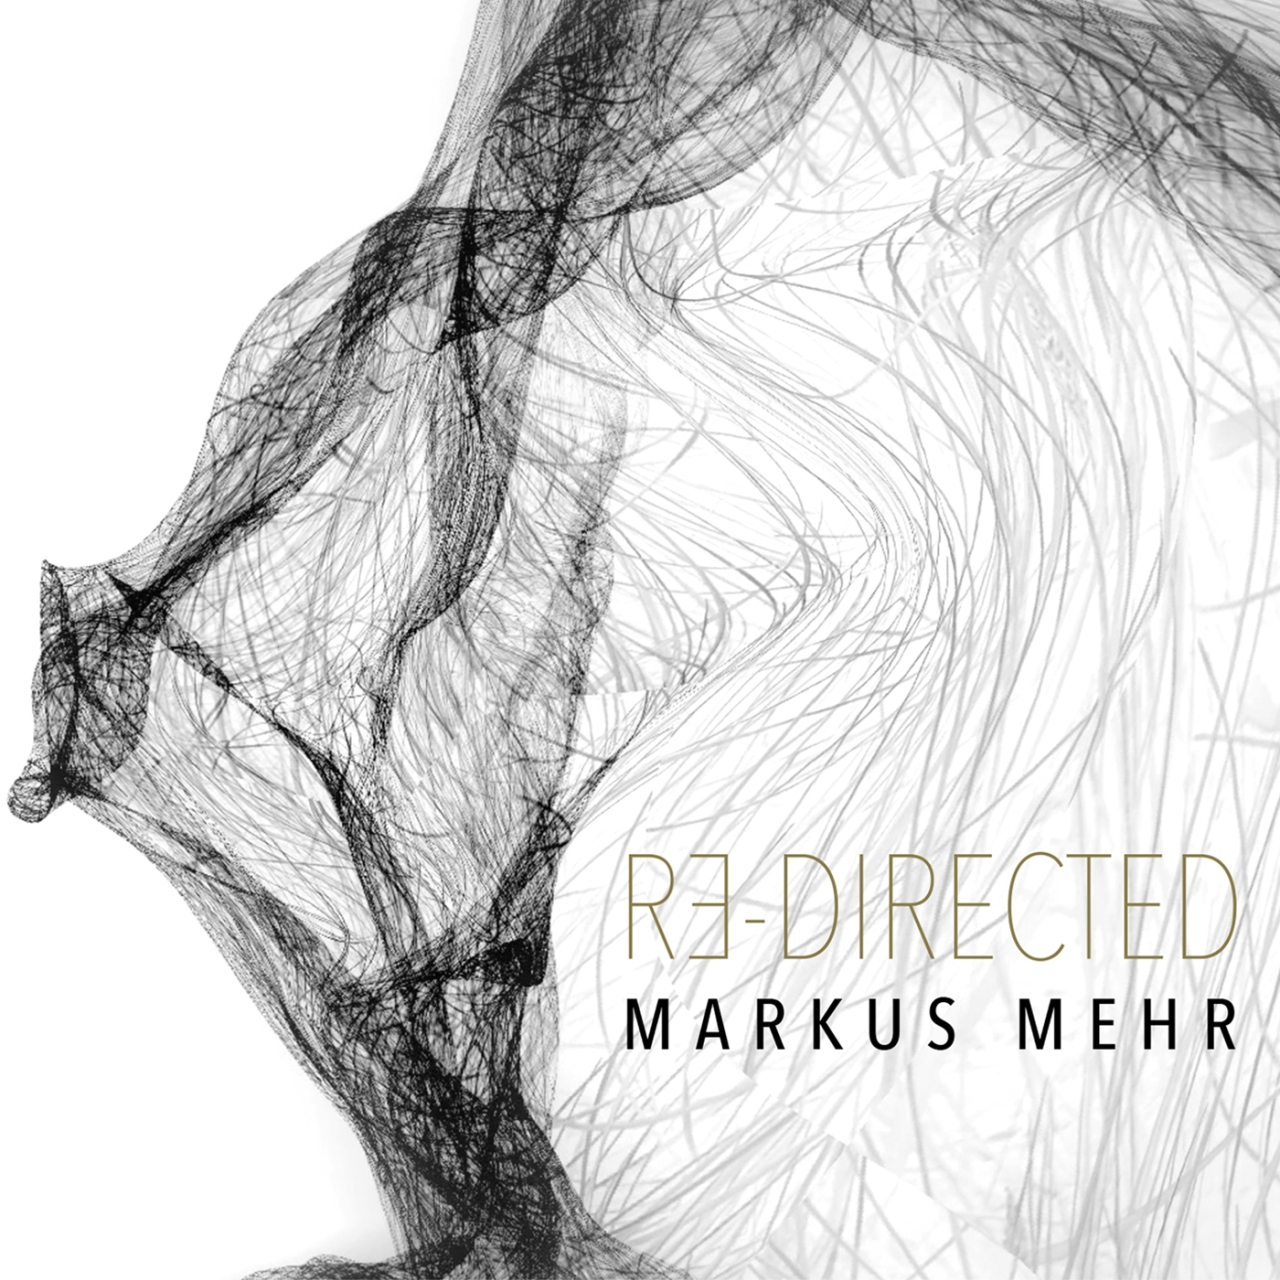 Markus Mehr ~Re-Directed